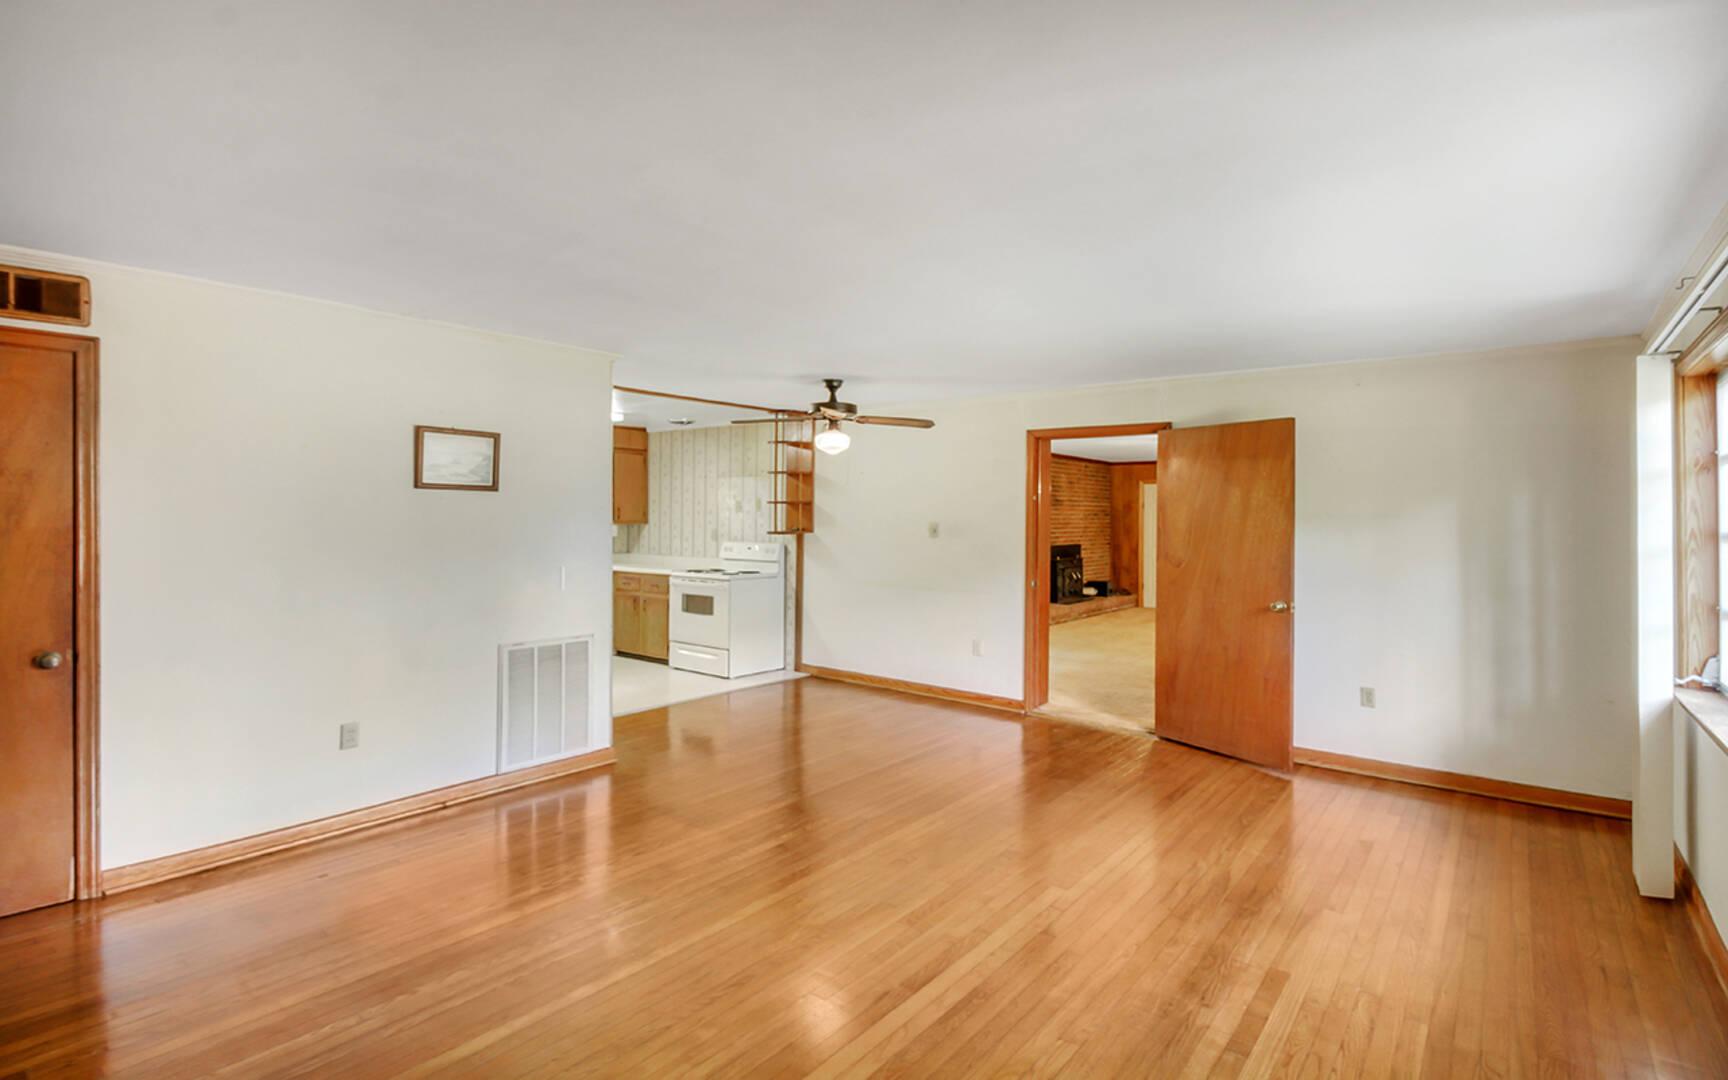 110 Barnwell Ave Rincon, GA 31326